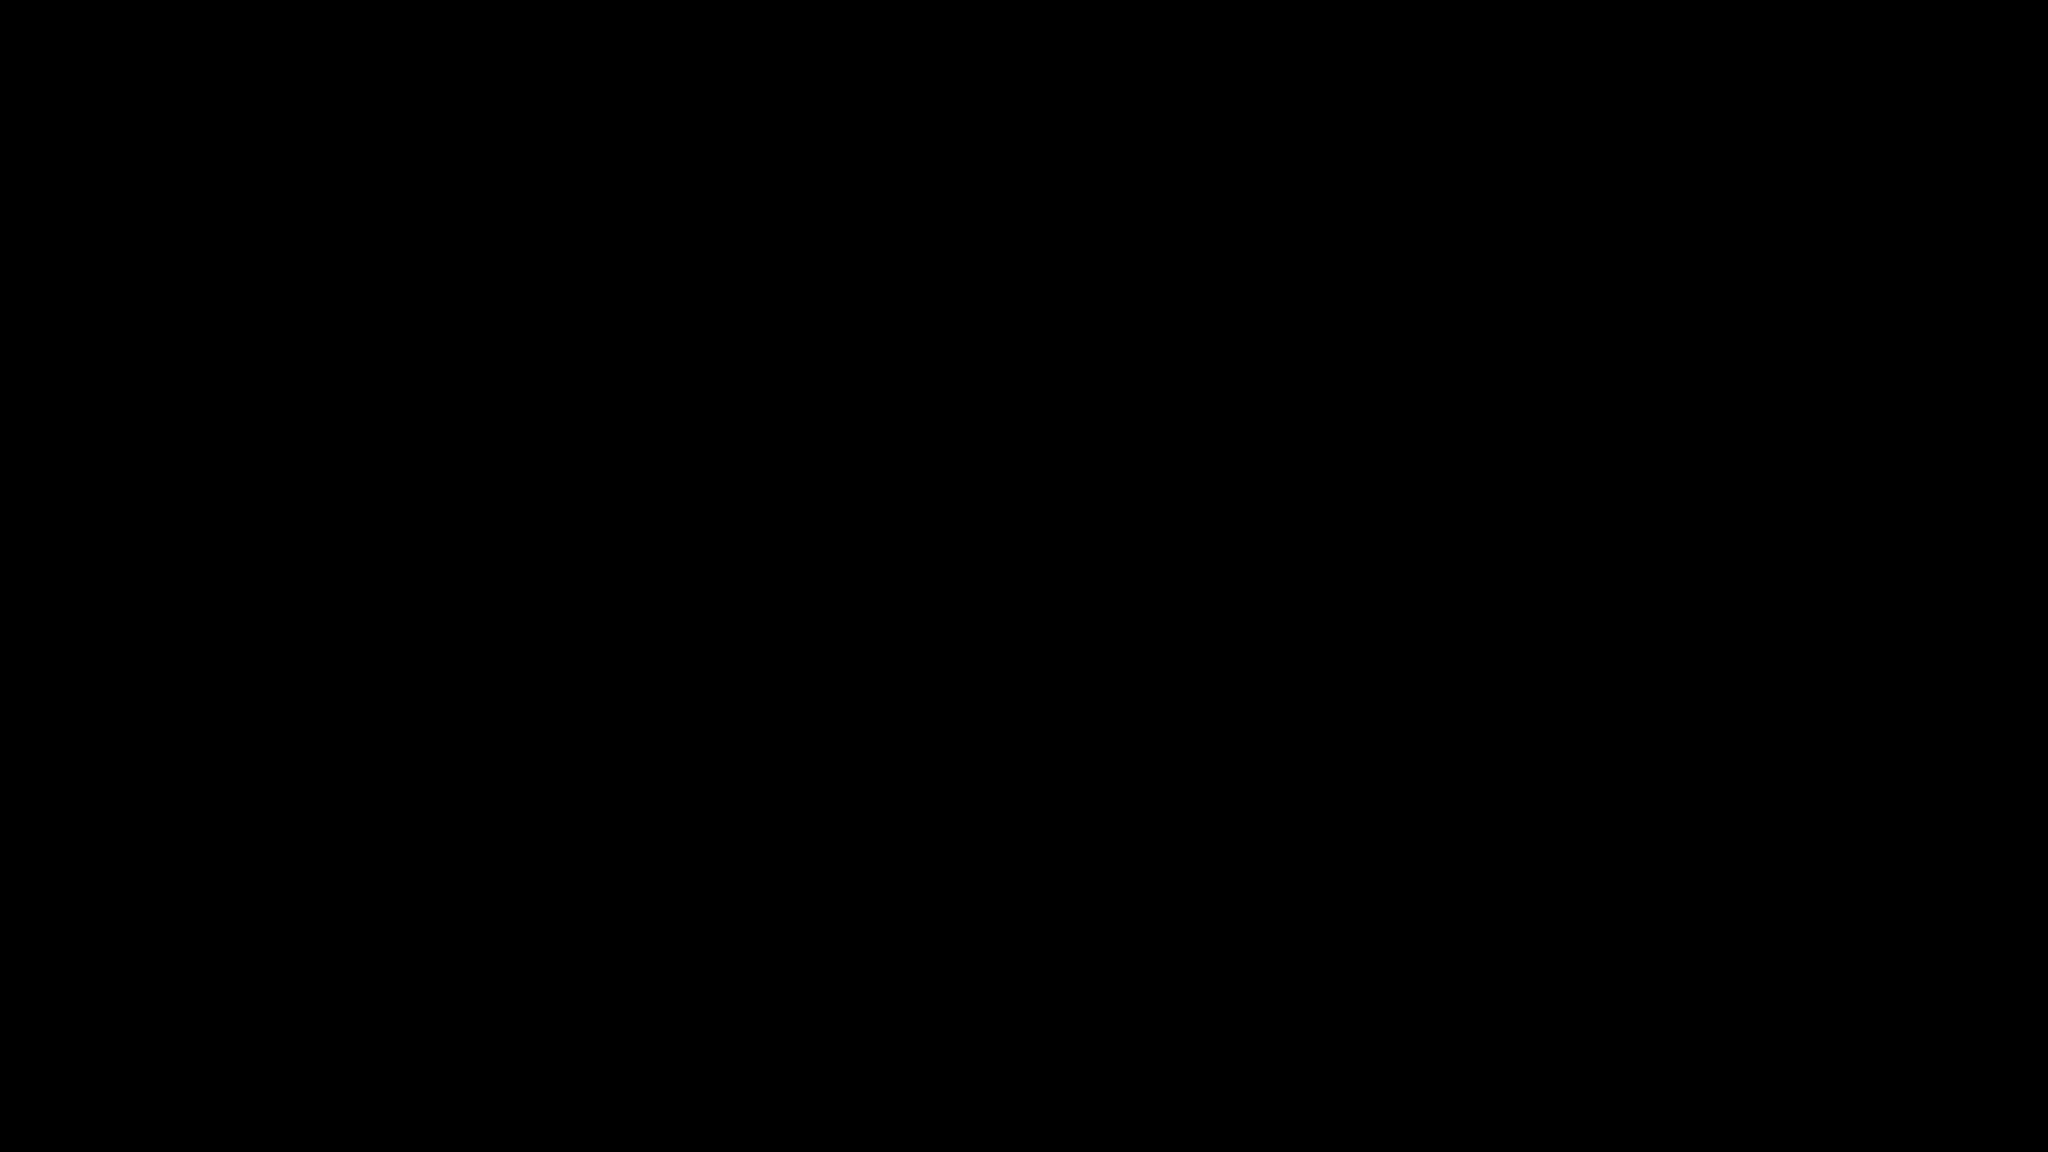 Joico-Emblem